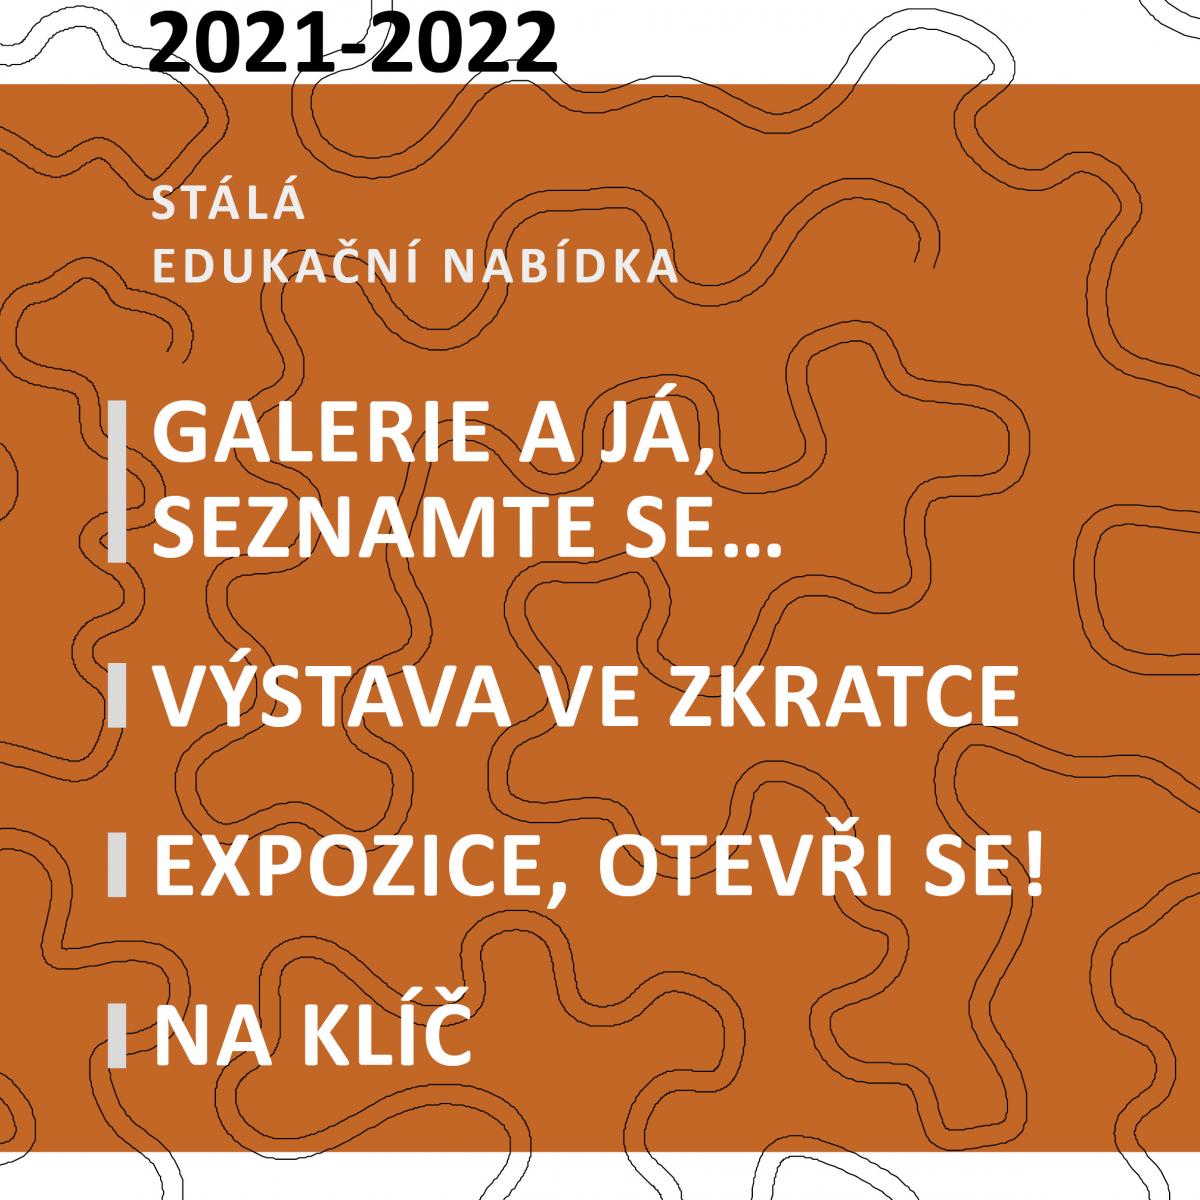 panely_nabidka_21_223.jpg